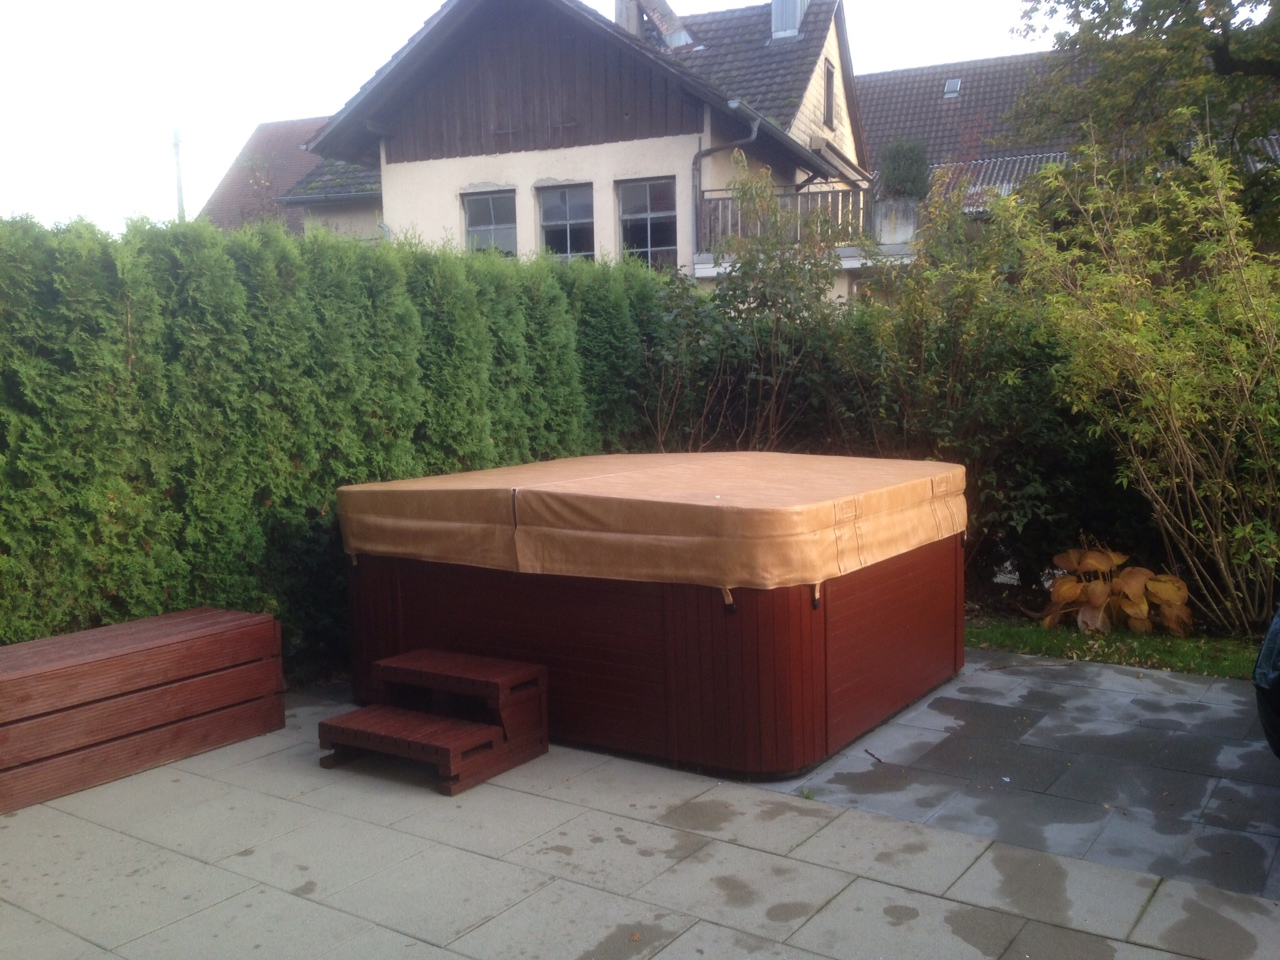 kundenmeinung zur whirlpool abdeckung cover zu nordic. Black Bedroom Furniture Sets. Home Design Ideas